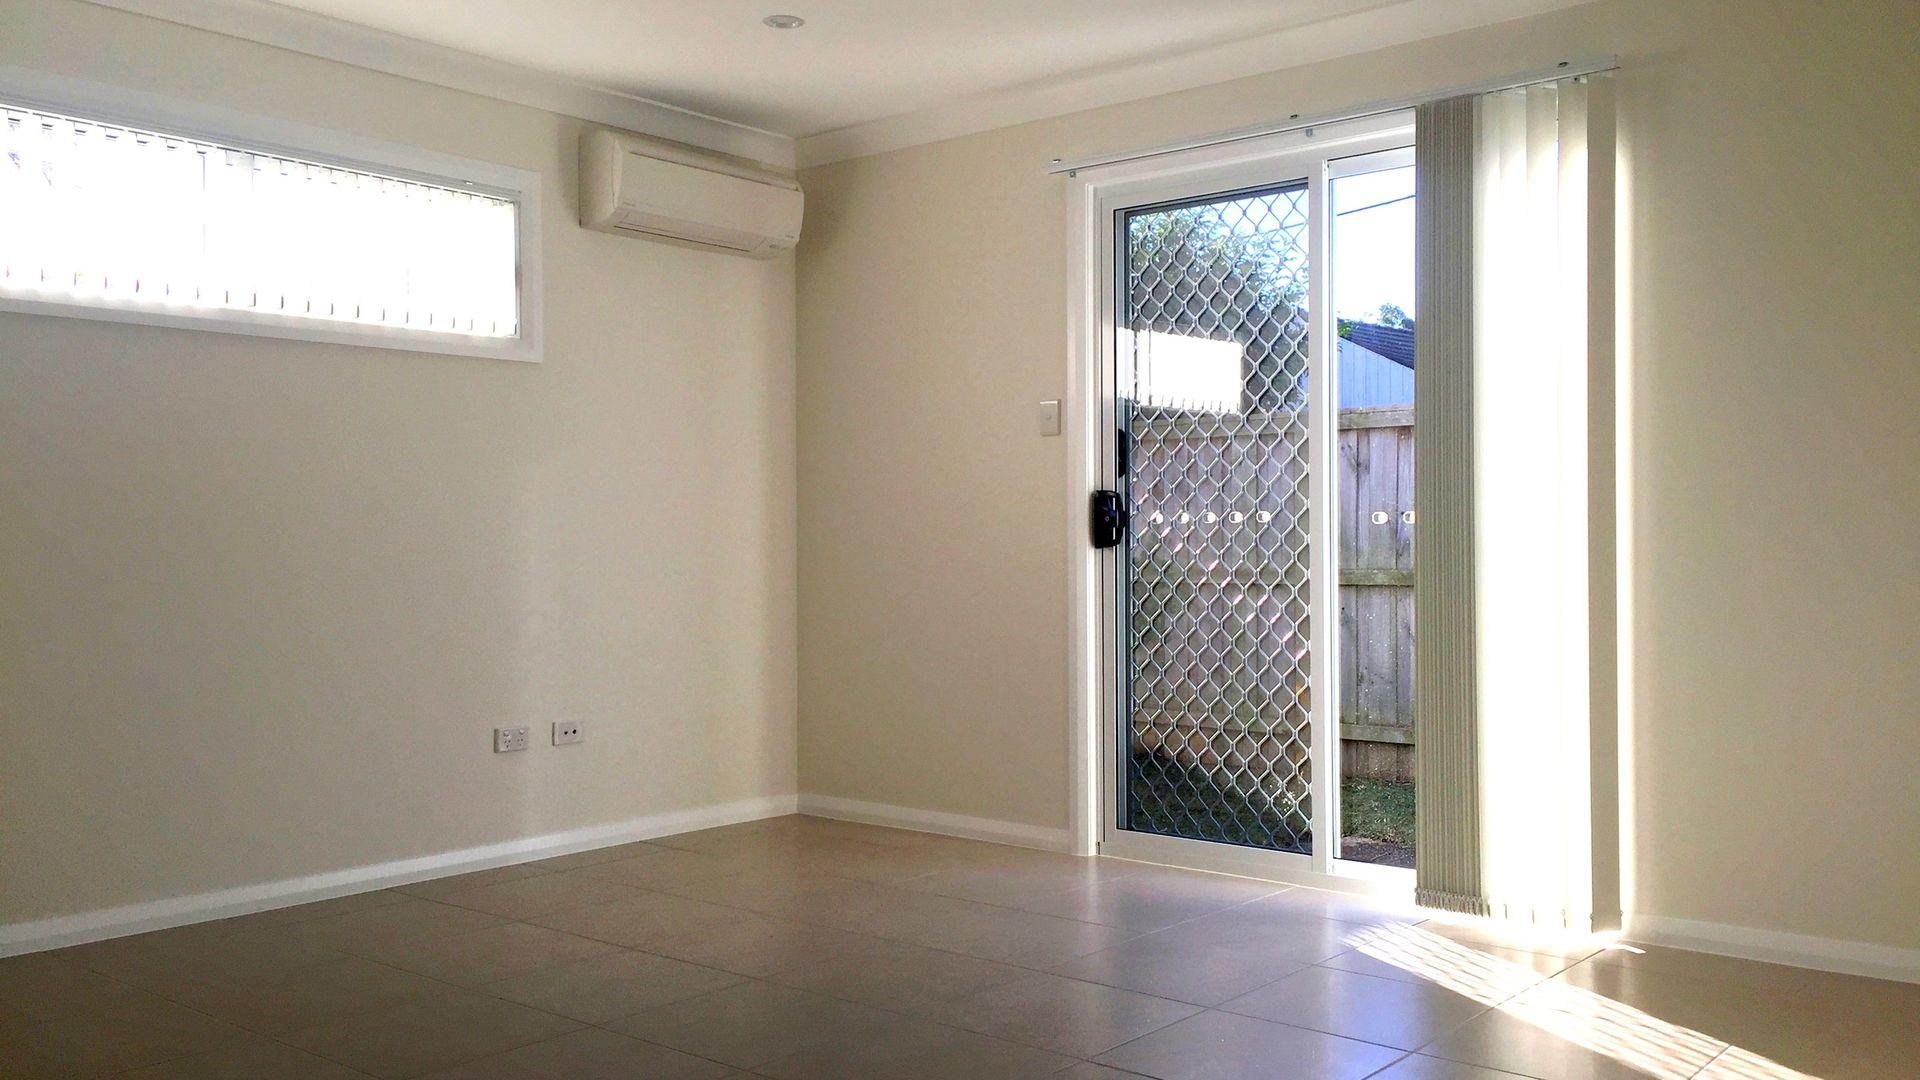 21A Patten Avenue, Merrylands NSW 2160, Image 1